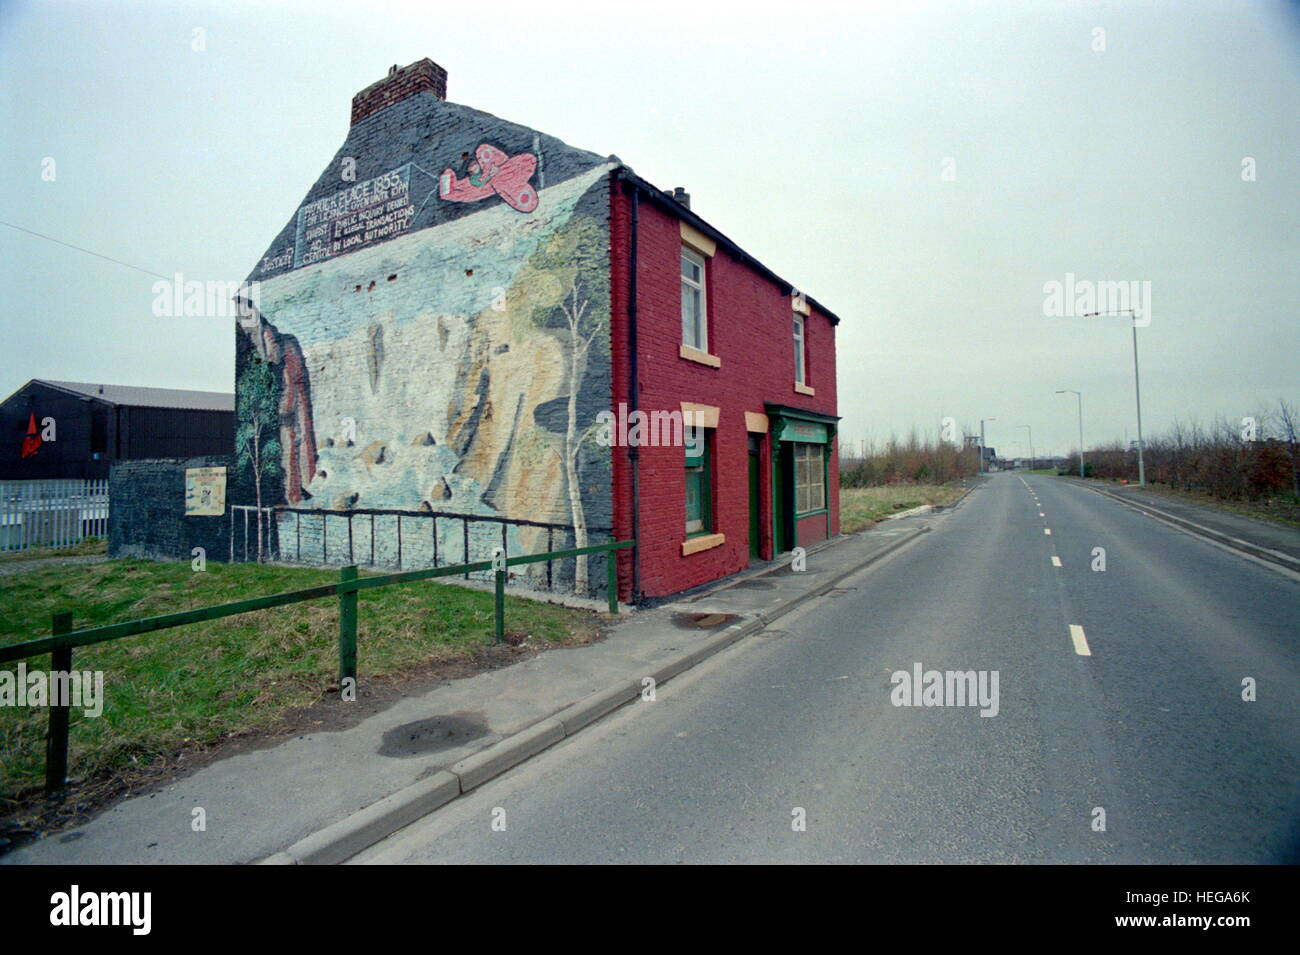 AJAXNETPHOTO. 1987. HEBBURN-ON-TYNE, ENGLAND. - PATRICK'S PLACE - ON WAGONWAY ROAD NEAR PALMER'S OLD SHIPBUILDING - Stock Image